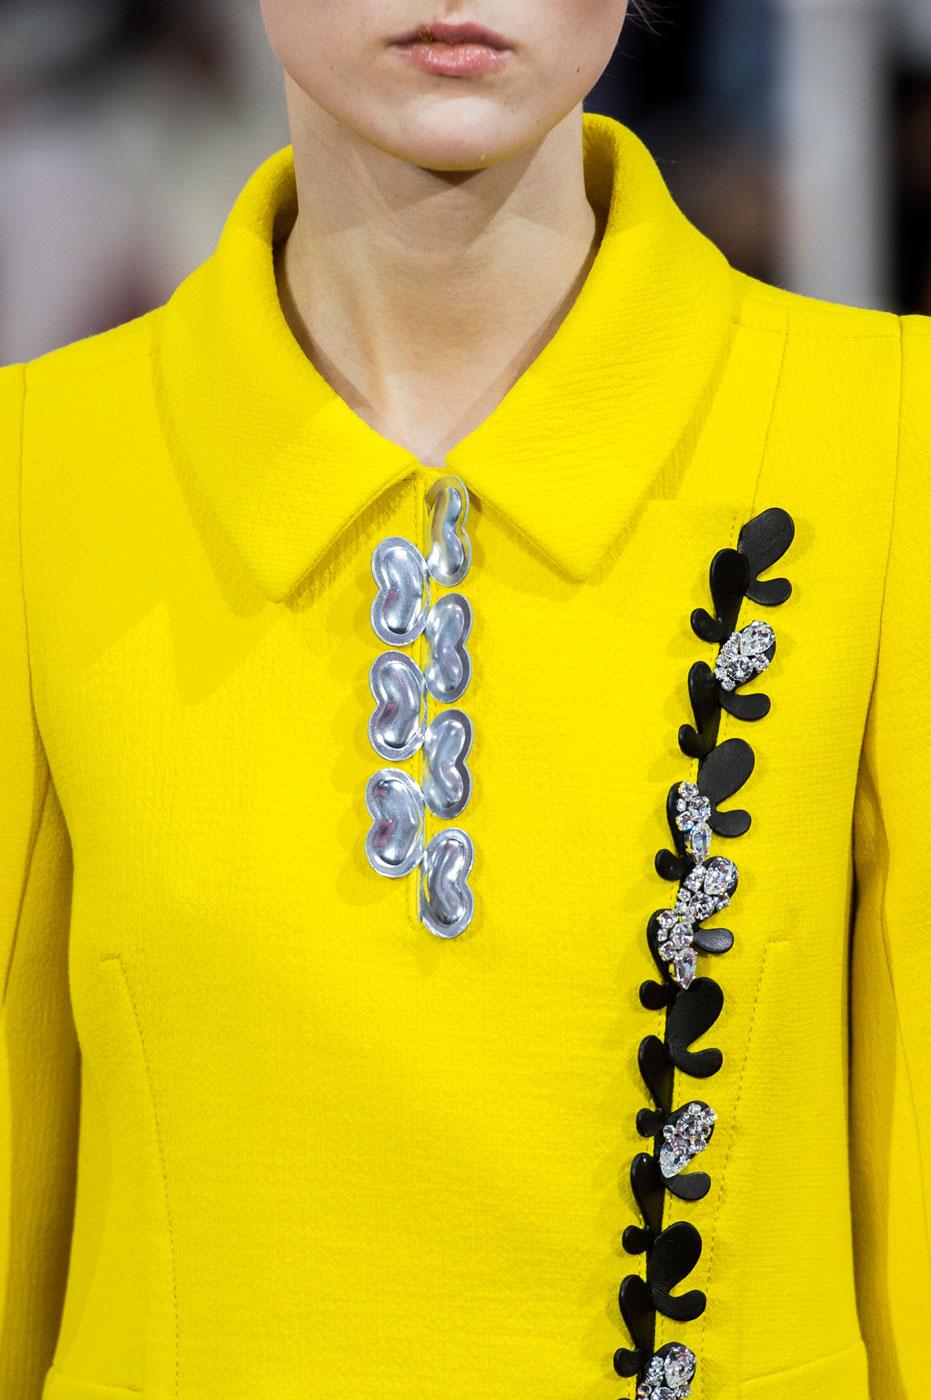 Christian-Dior-fashion-runway-show-close-ups-haute-couture-paris-spring-summer-2015-the-impression-197